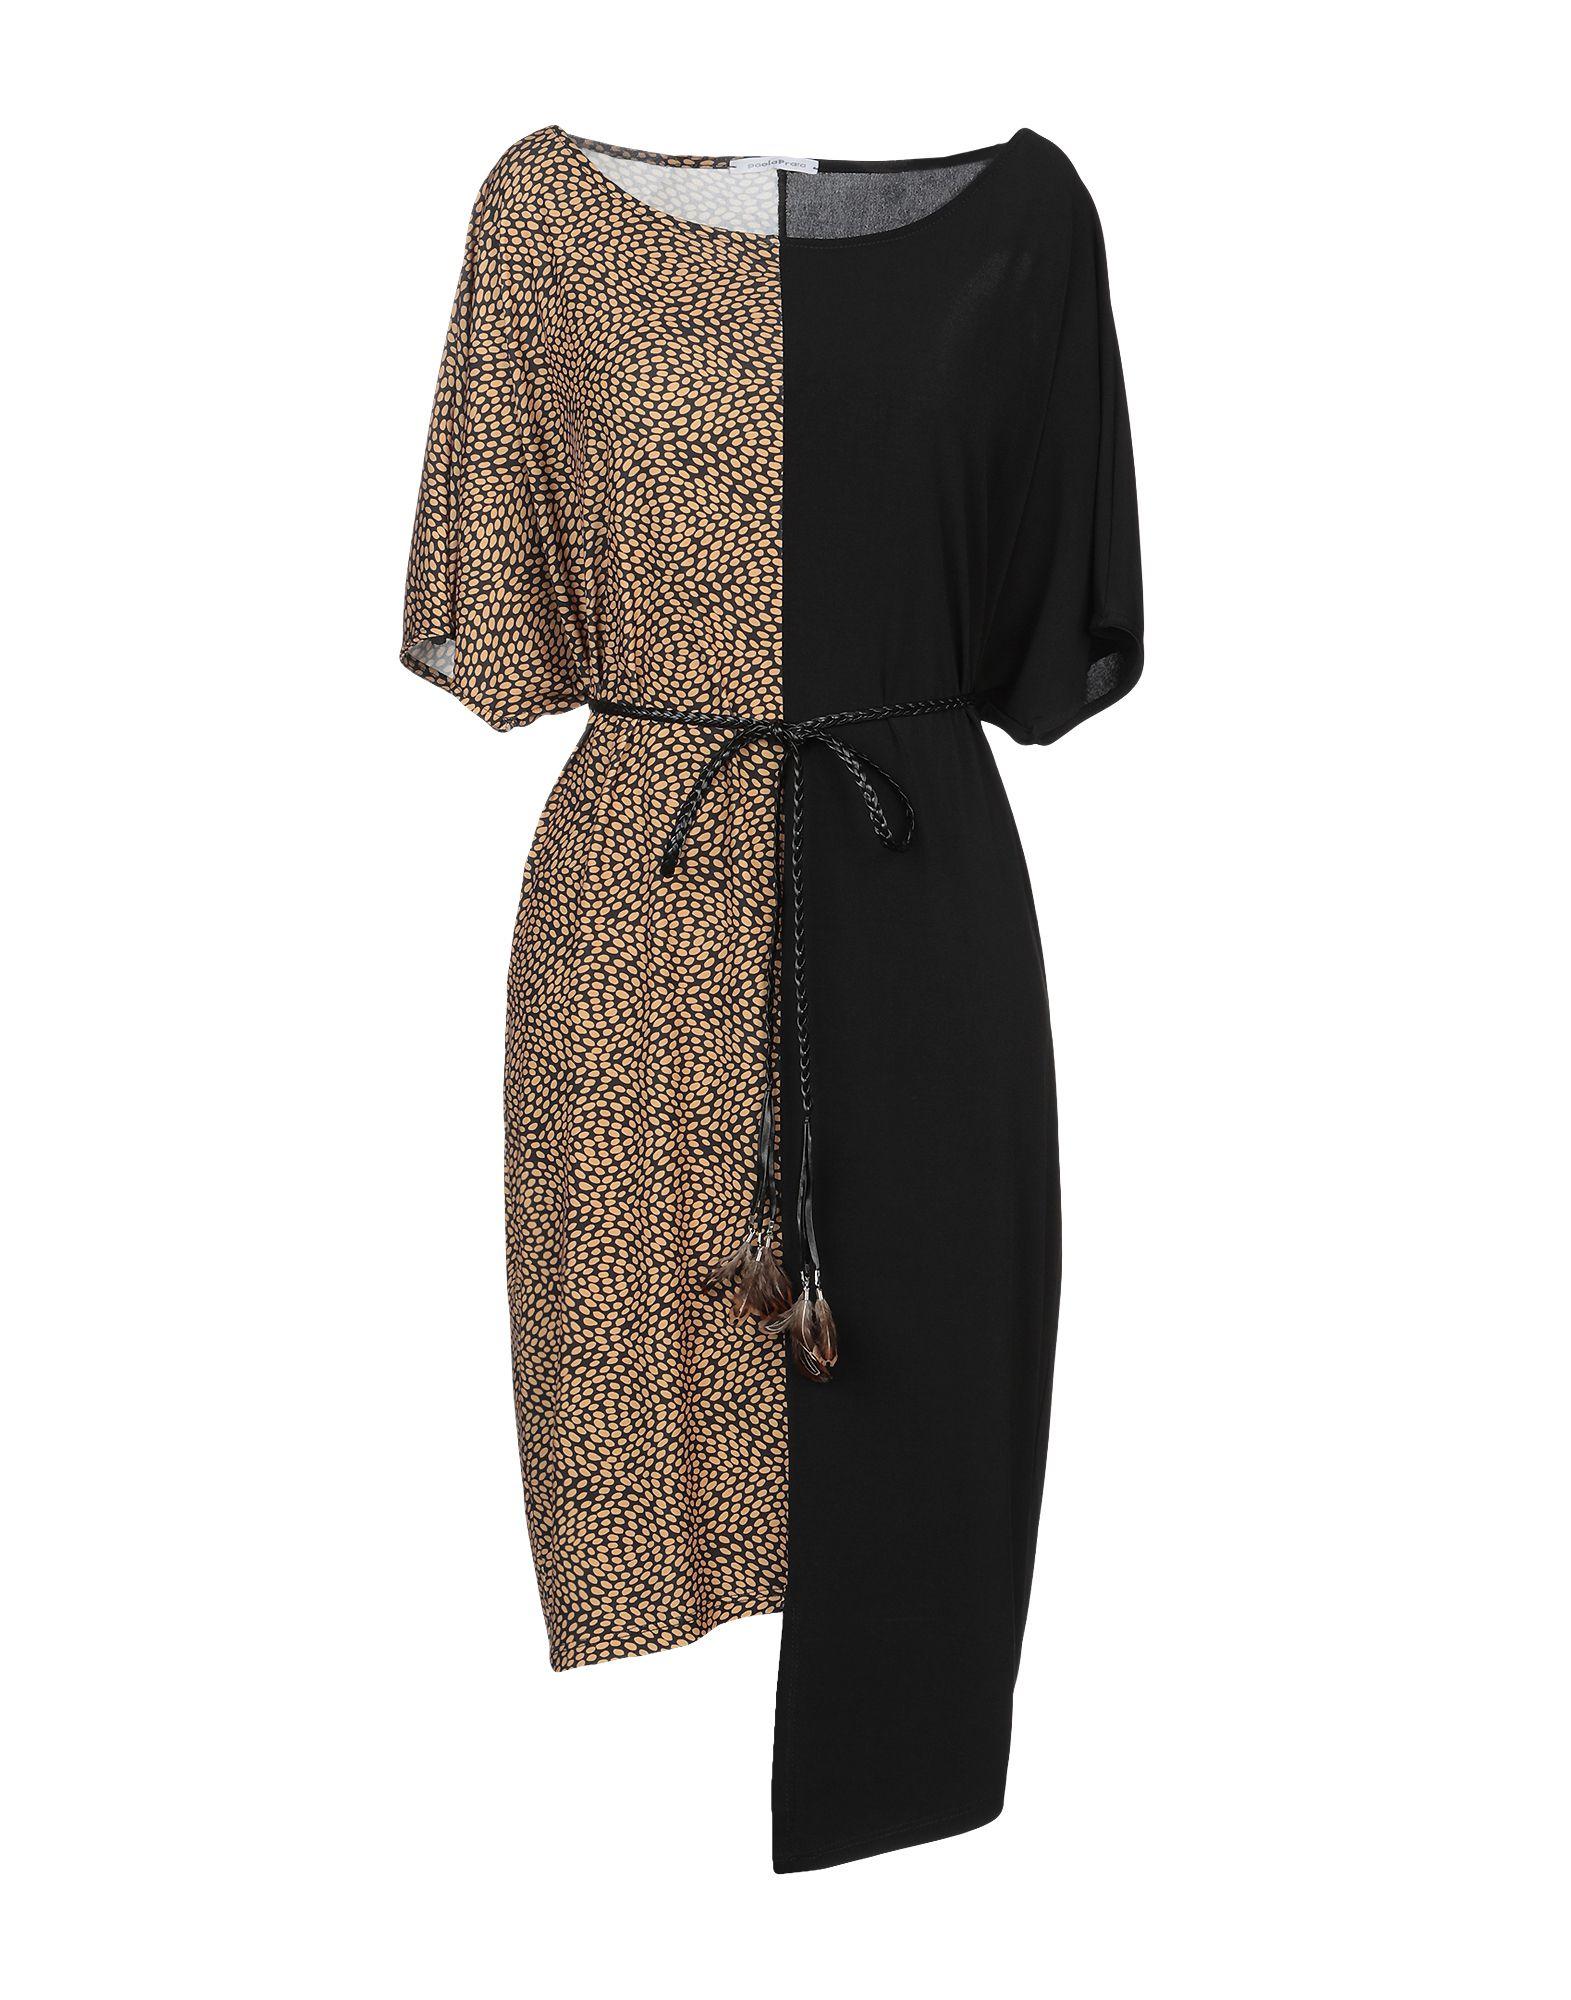 PAOLA PRATA Damen Kurzes Kleid Farbe Schwarz Größe 6